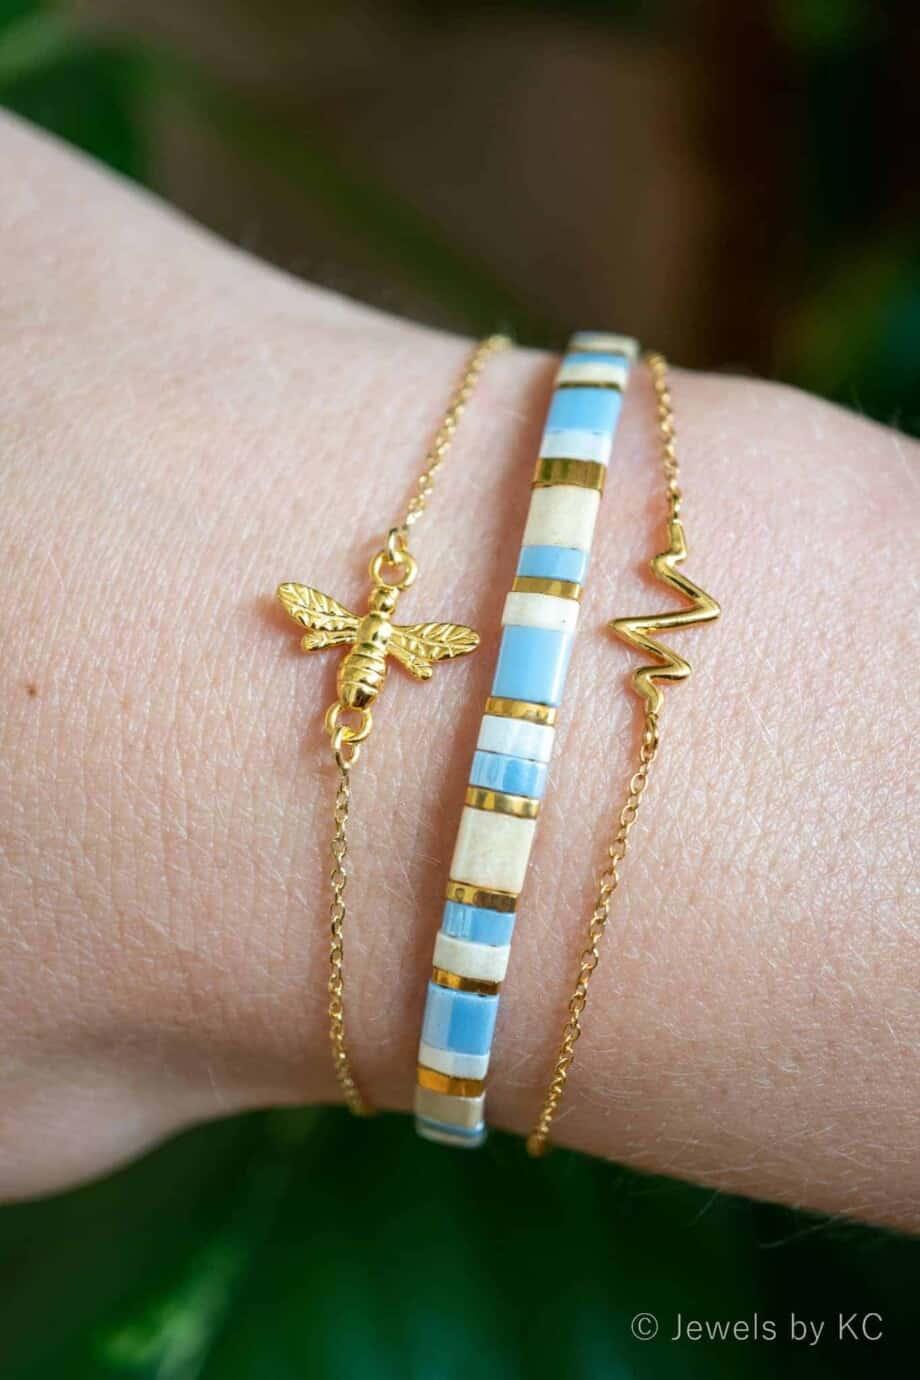 Goud Vermeil armband Buzzing Bee en Miyuki Pastel Blue en Heartbeat Goud Vermeil armband